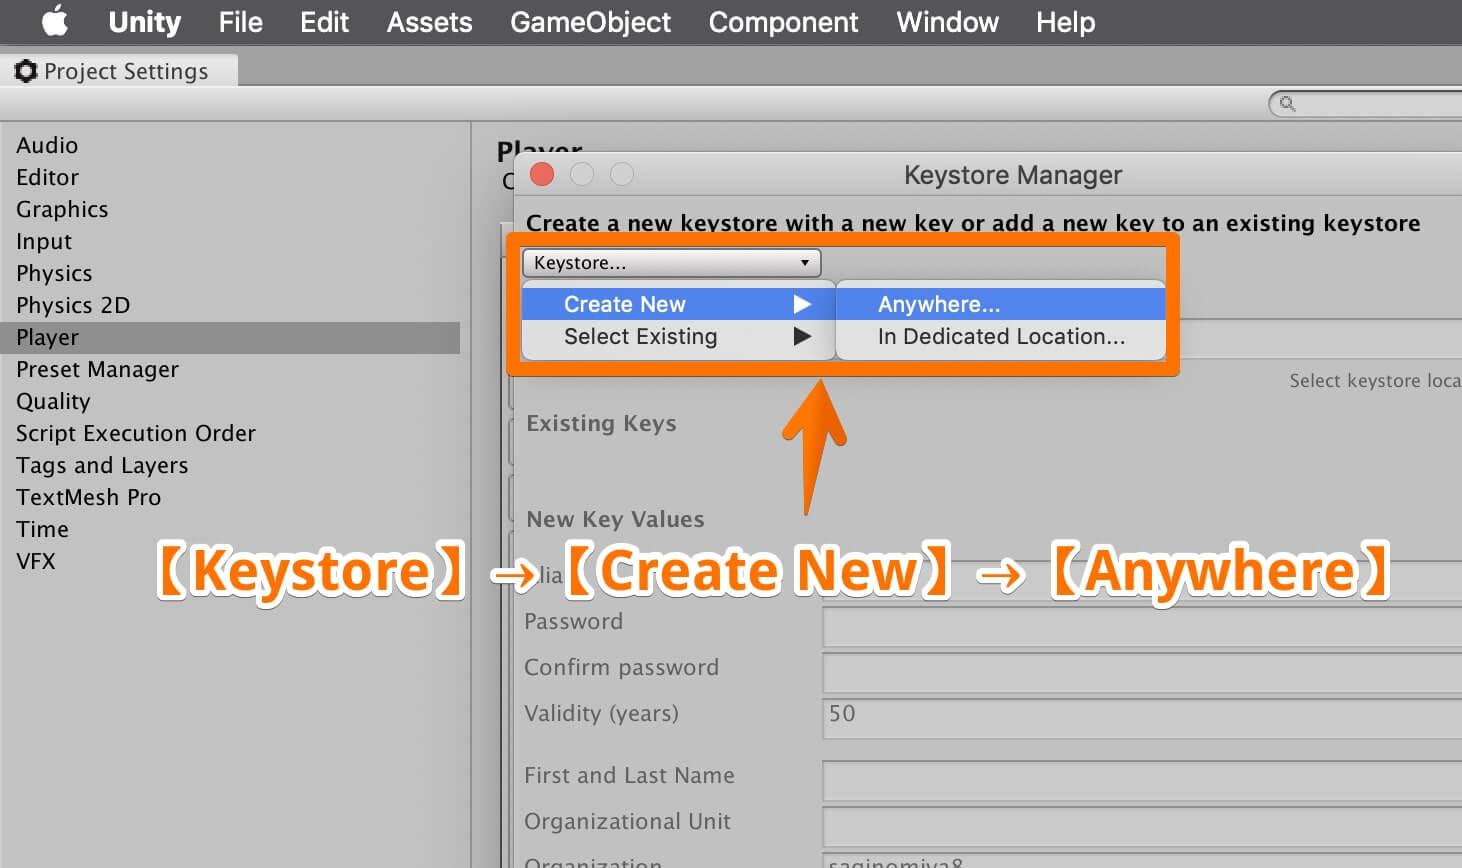 UnityでKeystoreを作る